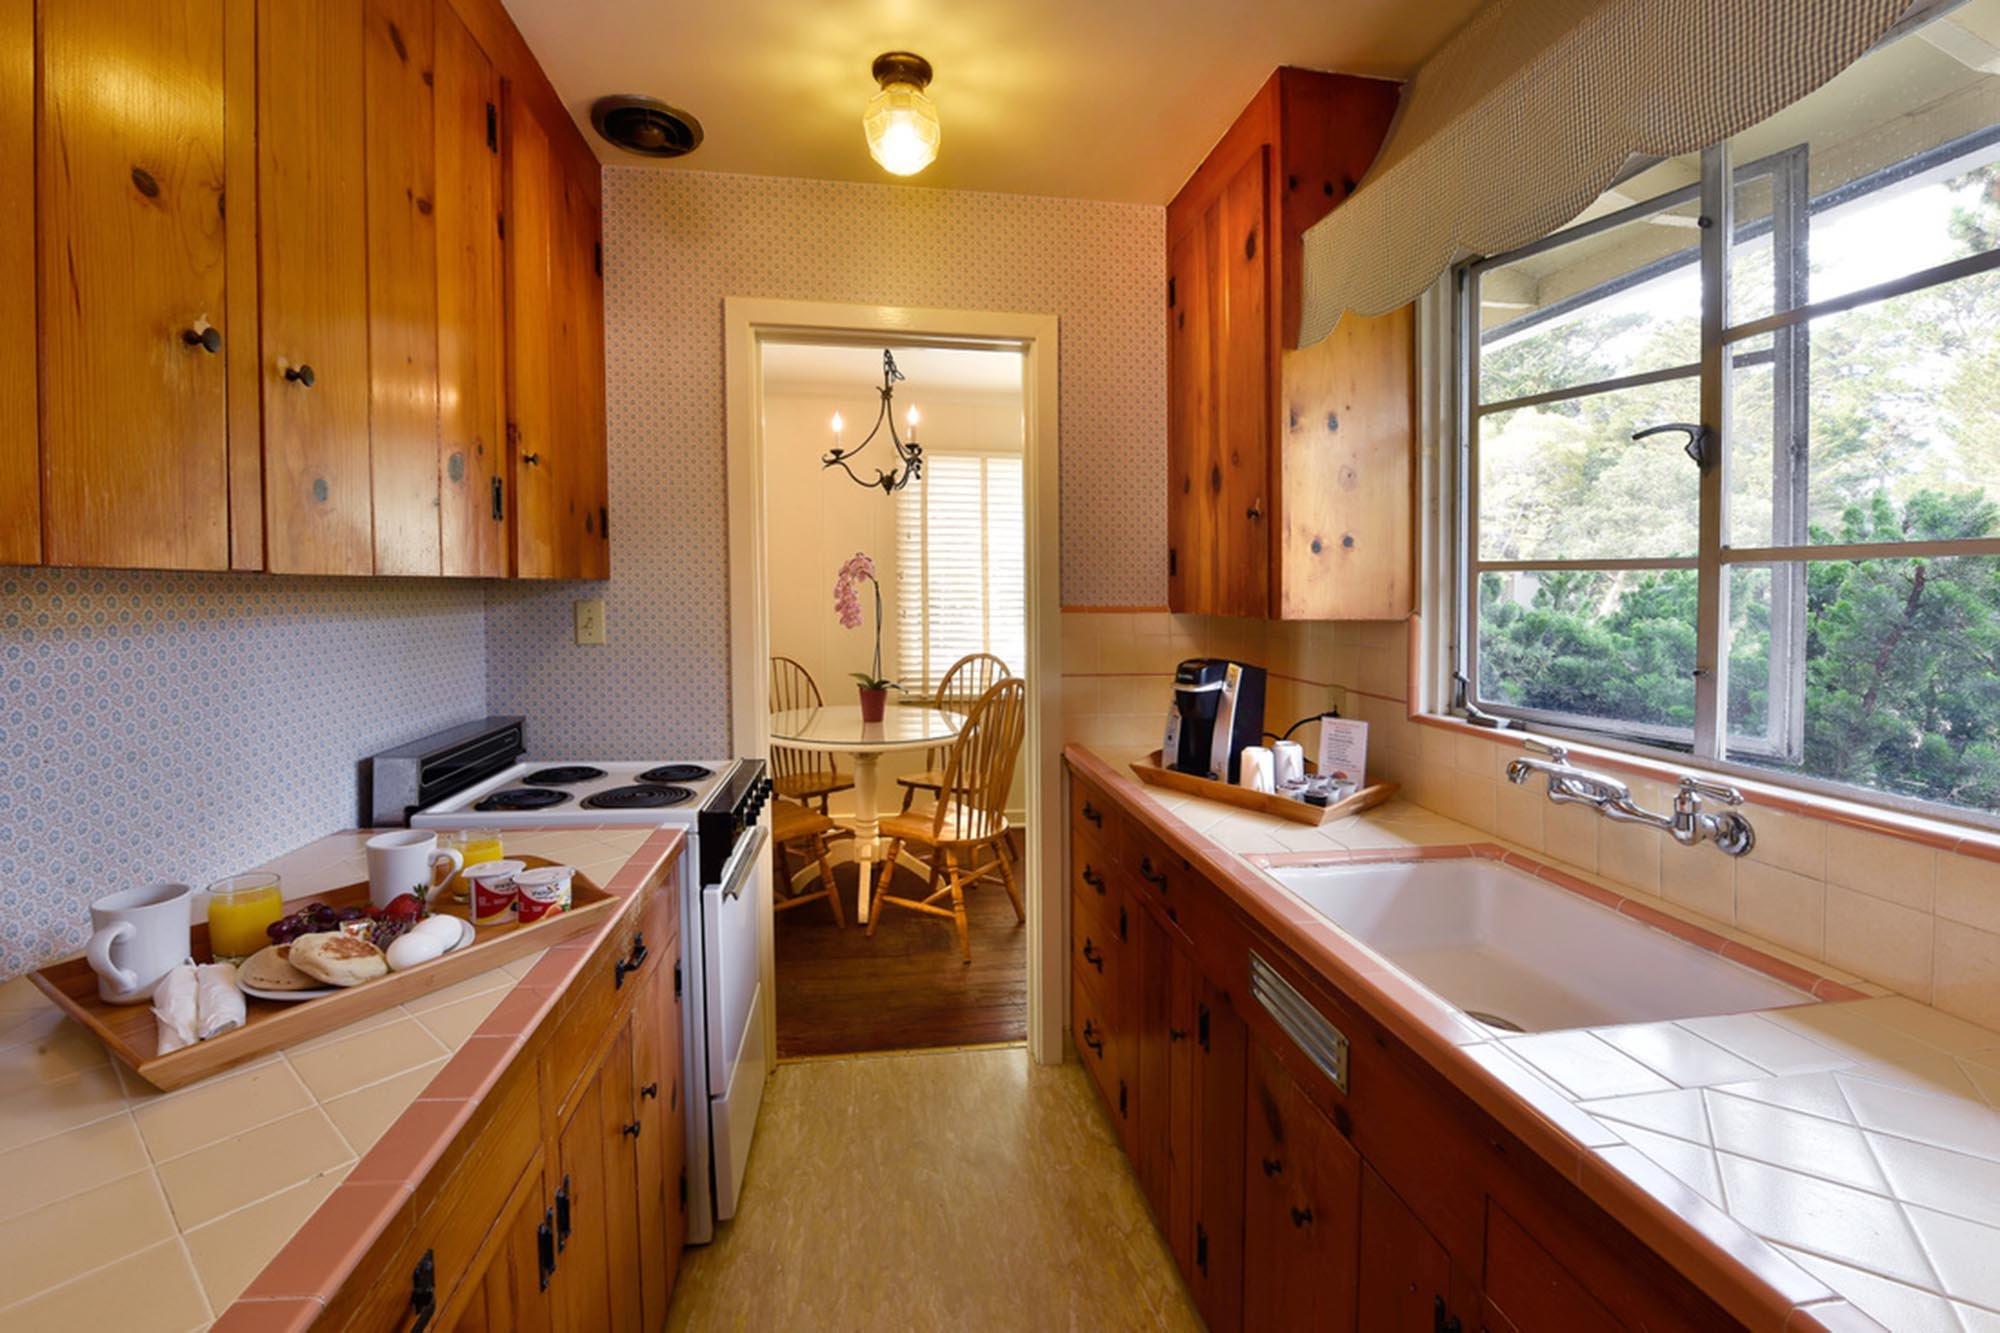 family friendly kitchen